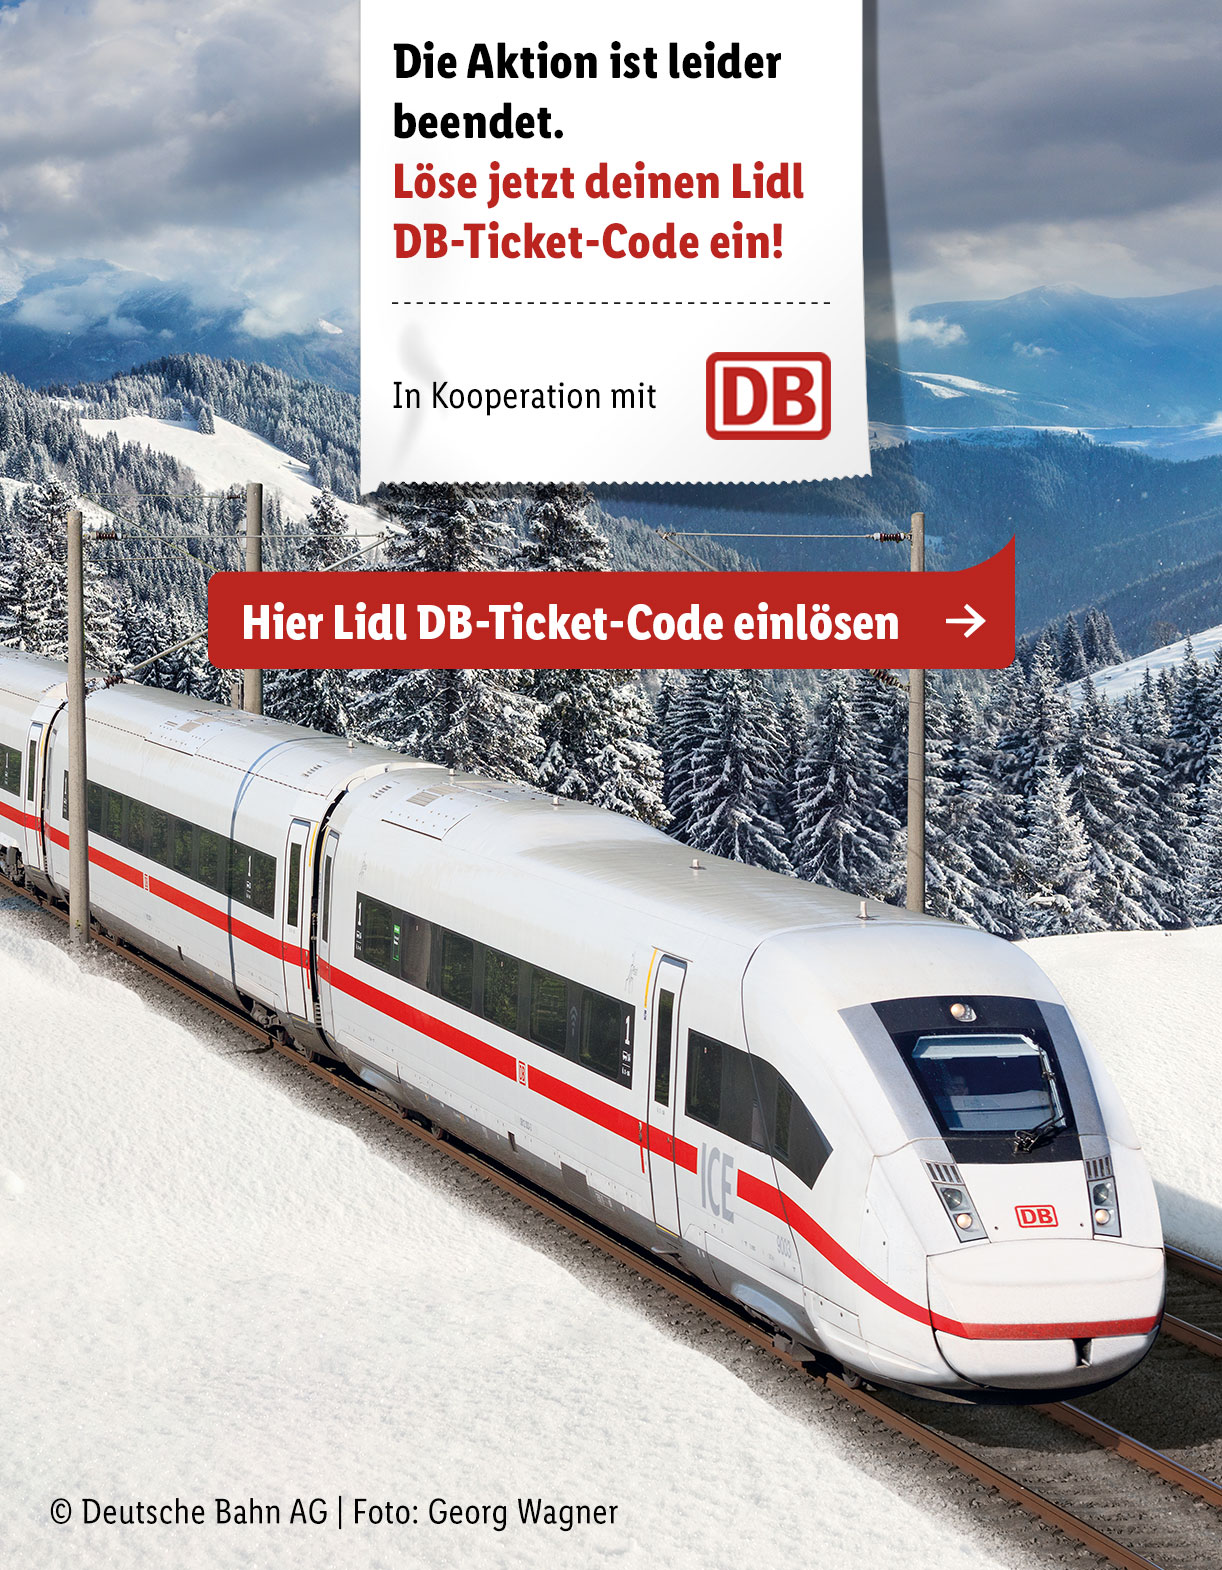 Lidl Db Ticket Bahnticket Kaufen Lidl Deutschland Lidlde